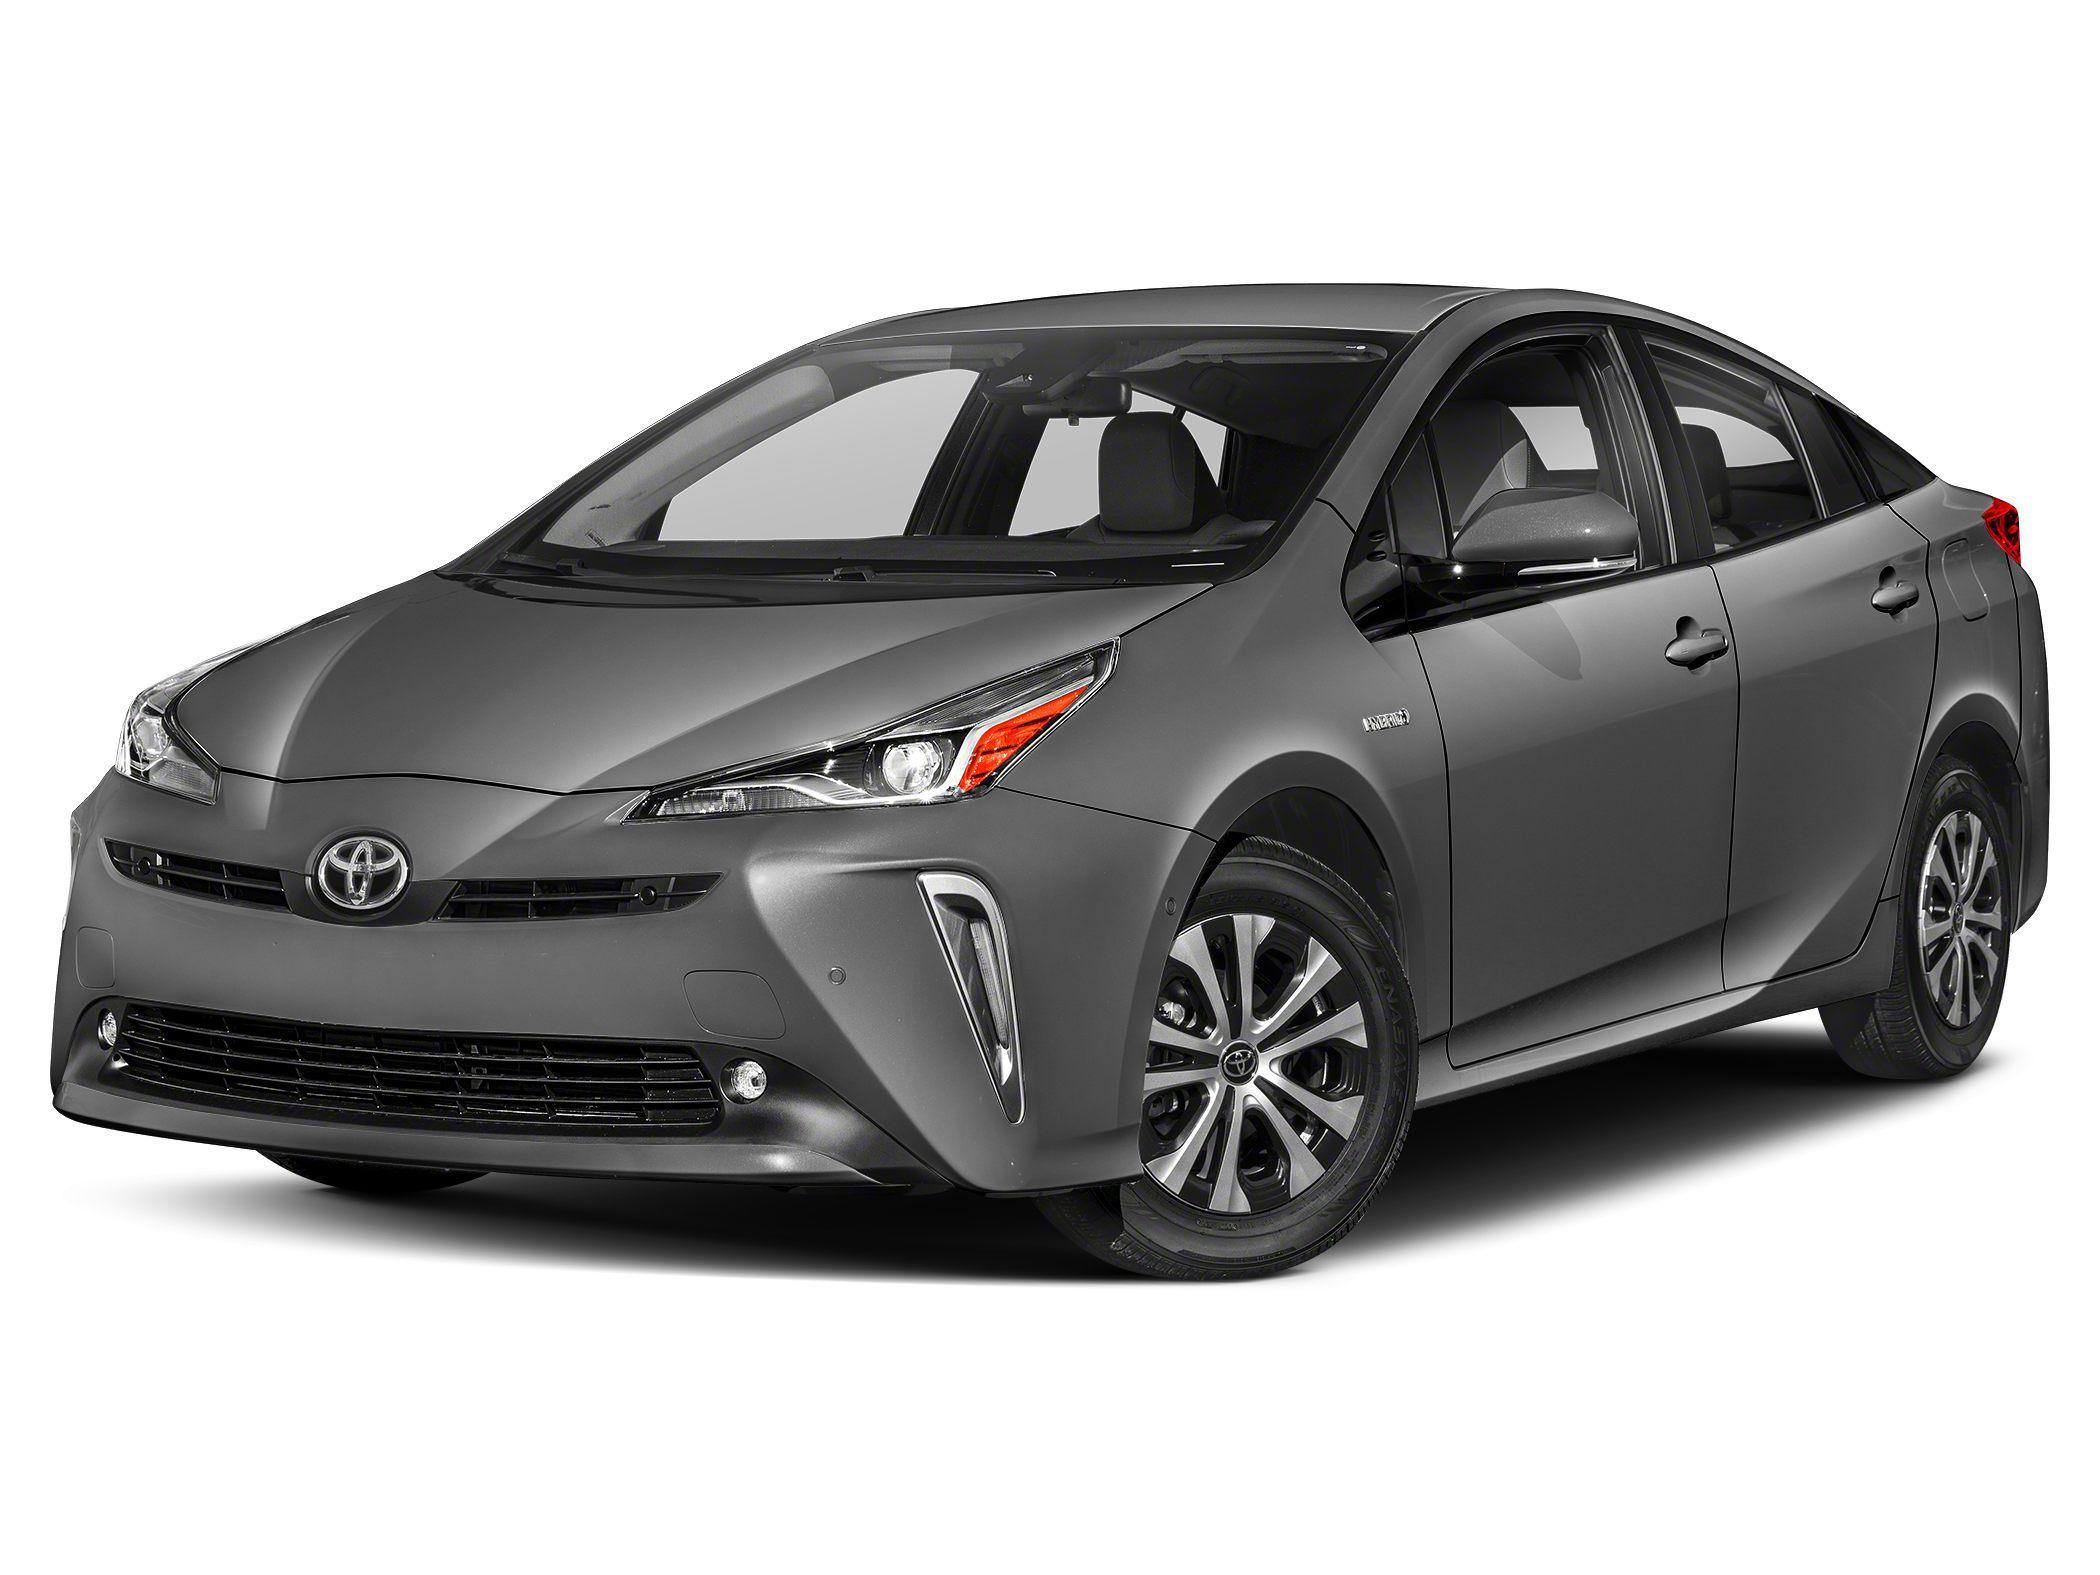 2022 Toyota Prius Hatchback